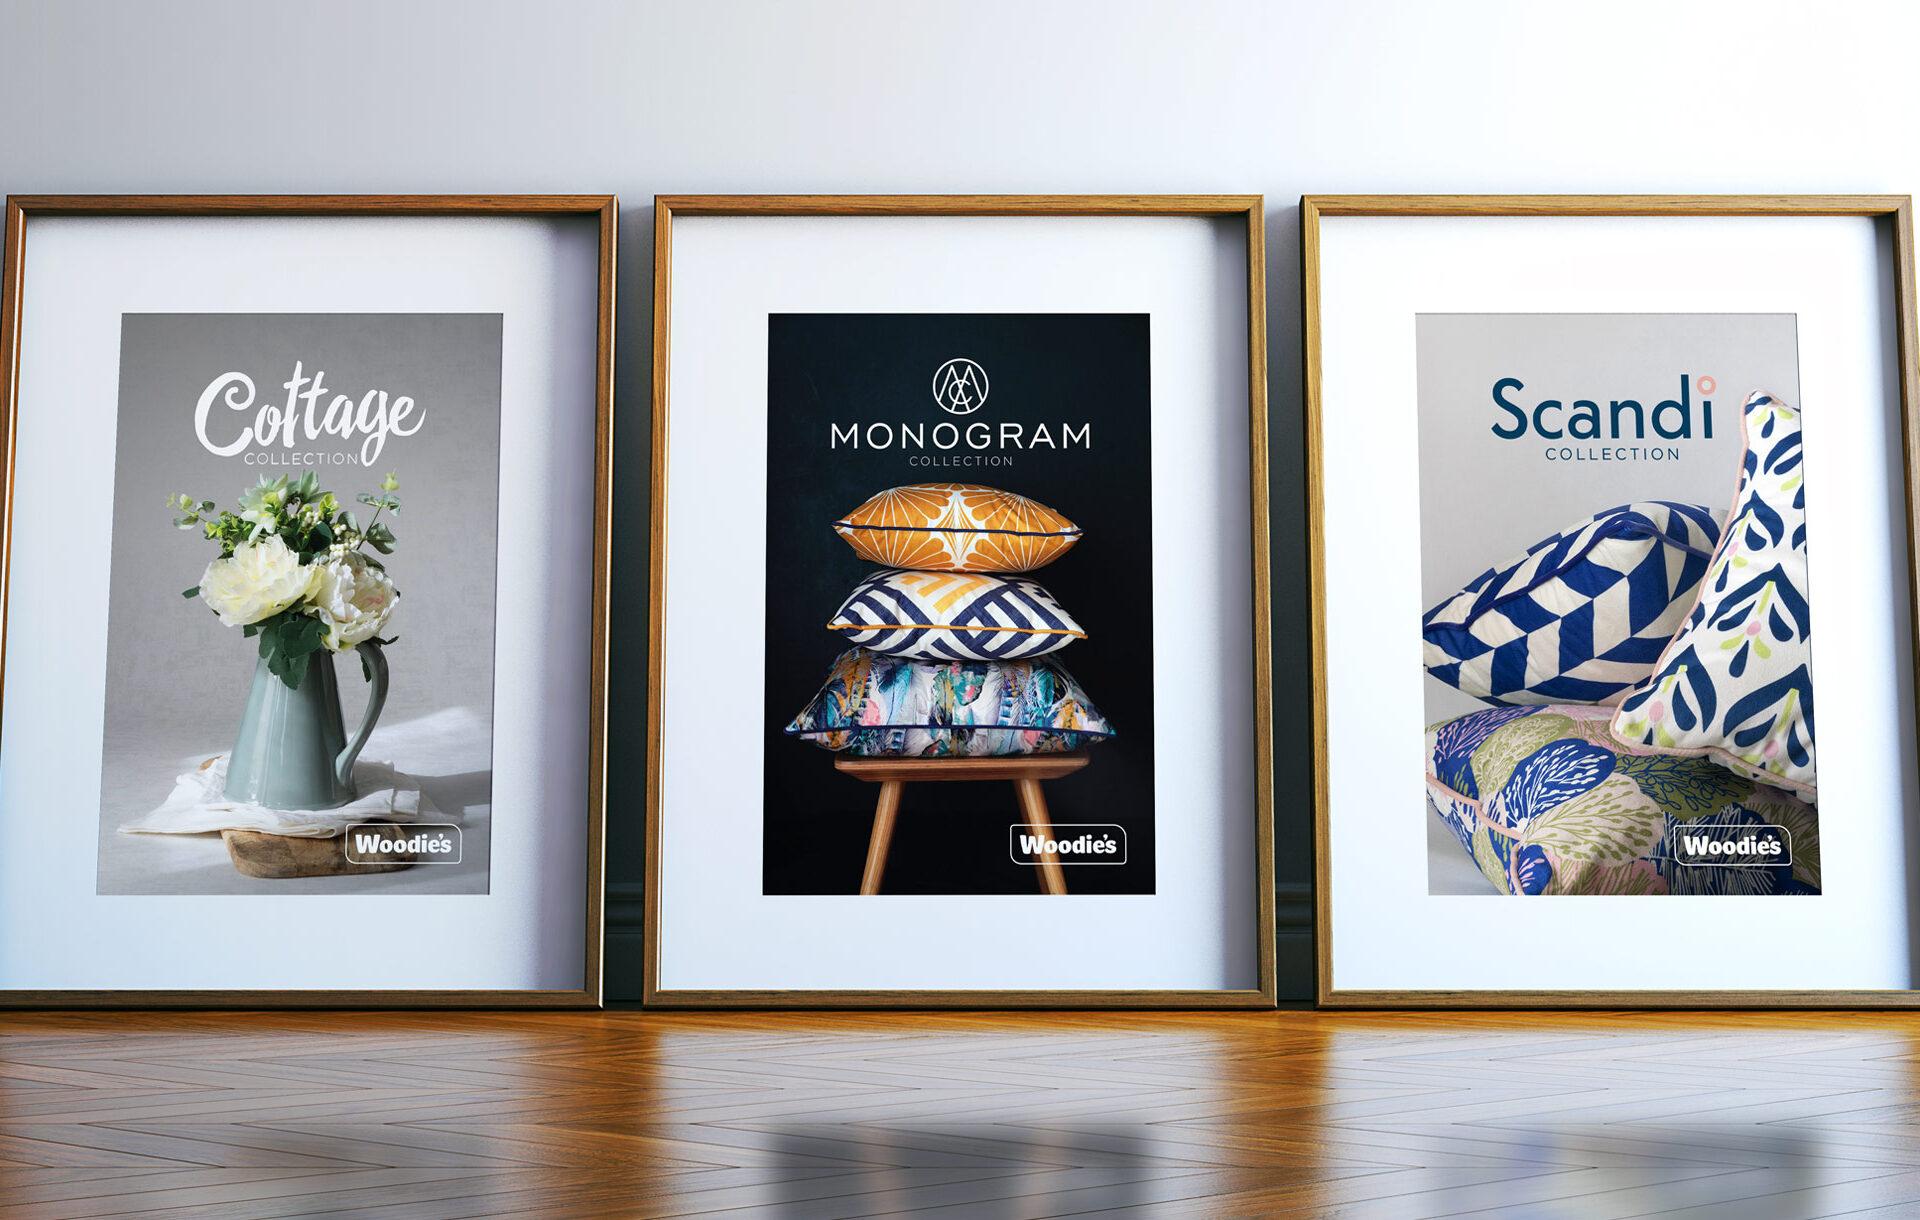 Principle brand agency Dublin Woodie's homewares brand design scandi monogram cottage picture frames